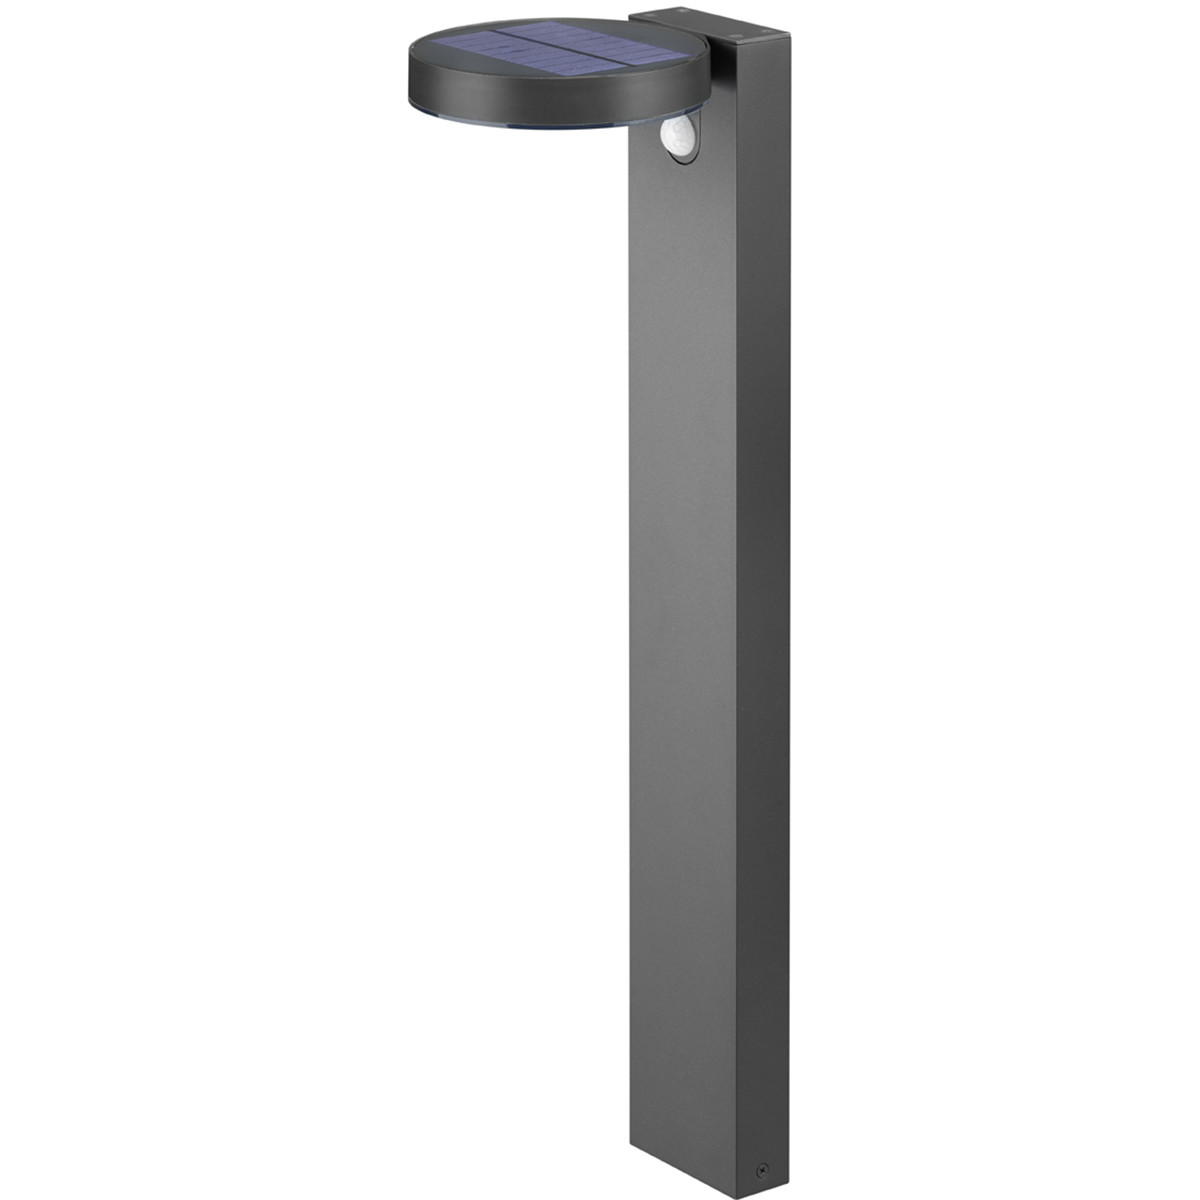 LED Solar Tuinverlichting - Paal/Sokkel - Trion Posino - Zonne-energie - Bewegingssensor - 4W - Antraciet - RVS